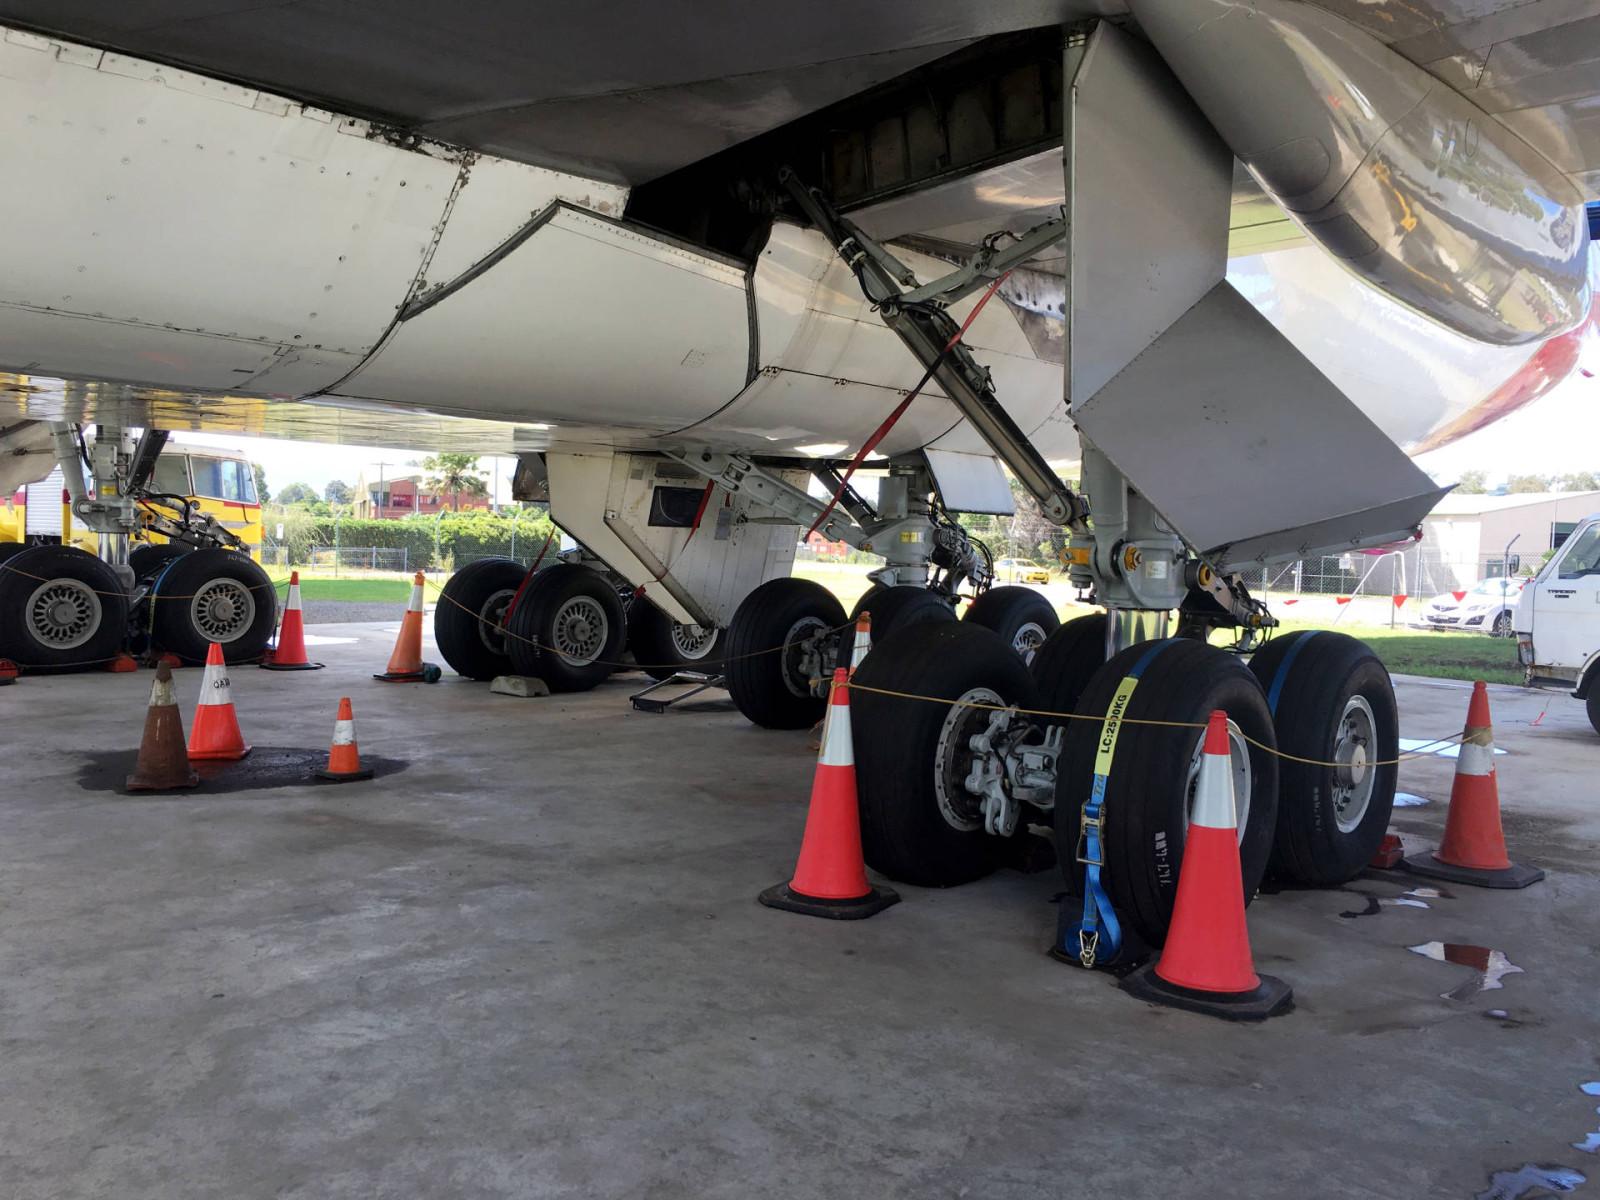 hars_museum_Quantas_boeing_747_undercarriage_tyres